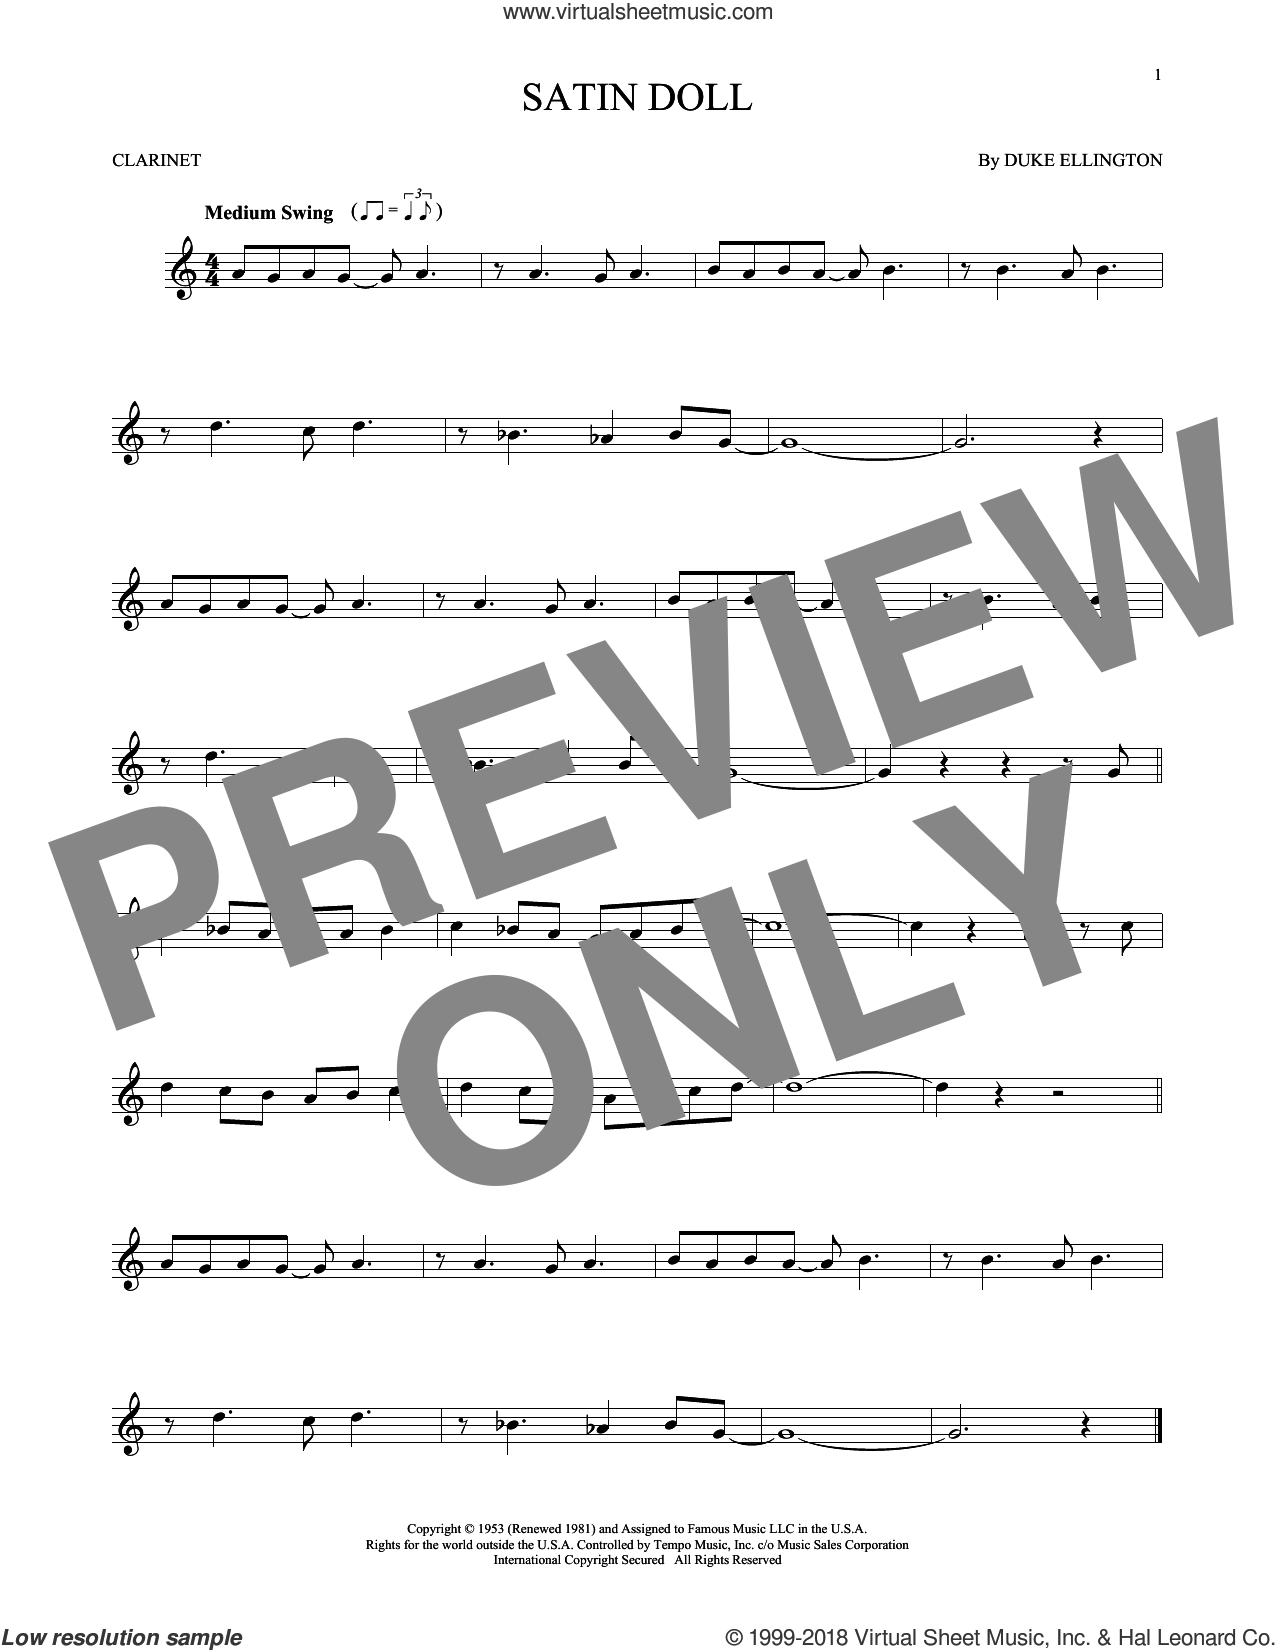 Satin Doll sheet music for clarinet solo by Duke Ellington, Billy Strayhorn and Johnny Mercer, intermediate skill level